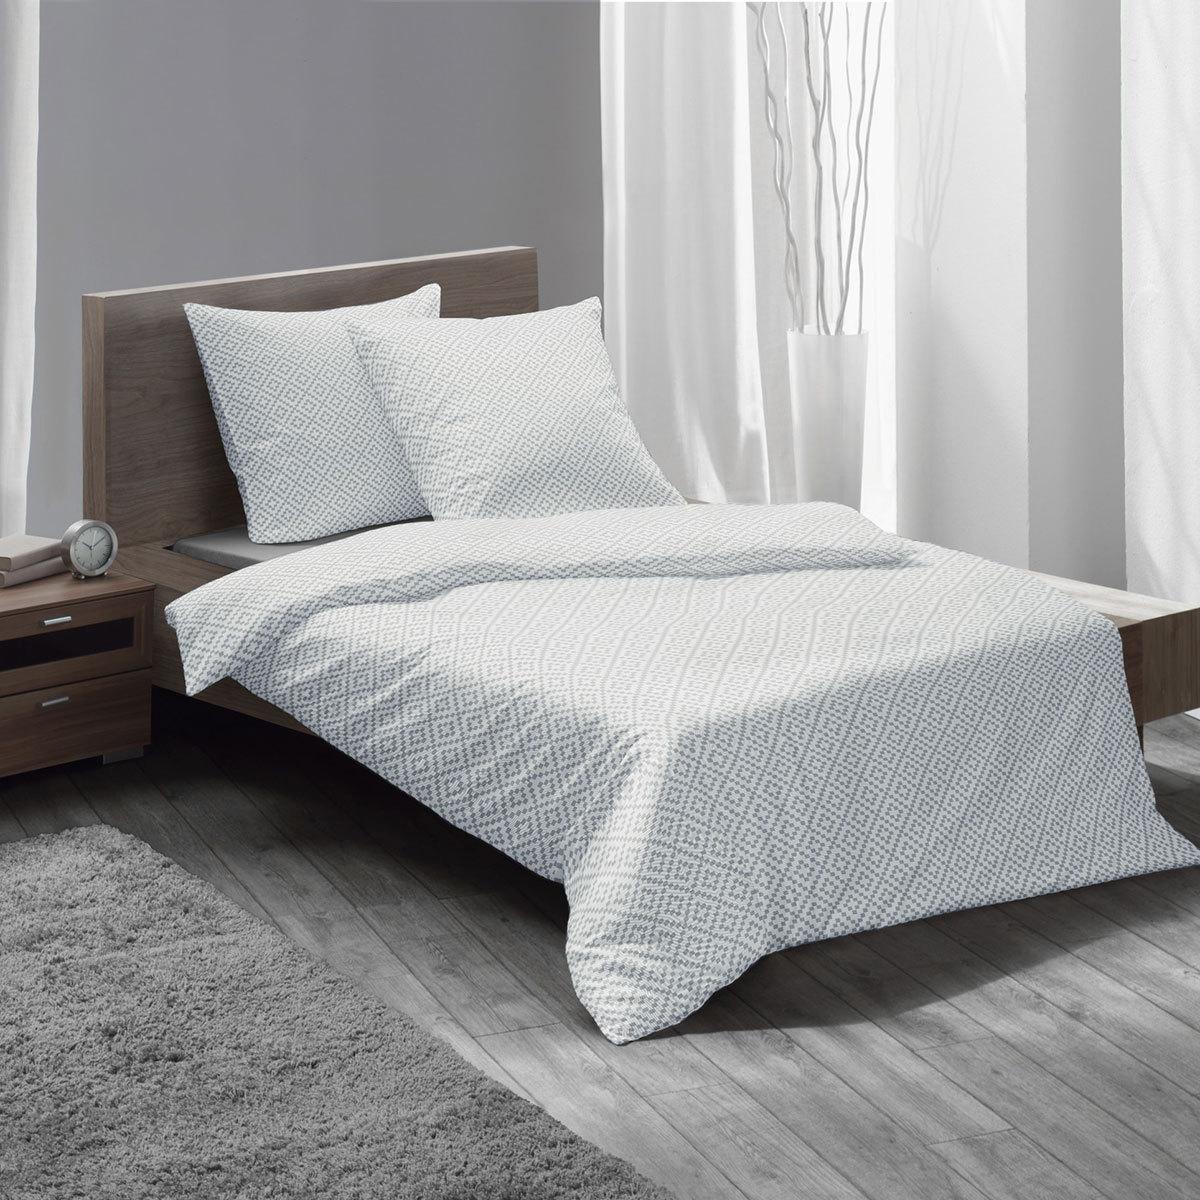 fleuresse edelflanell bettw sche 603740 11 g nstig online kaufen bei bettwaren shop. Black Bedroom Furniture Sets. Home Design Ideas